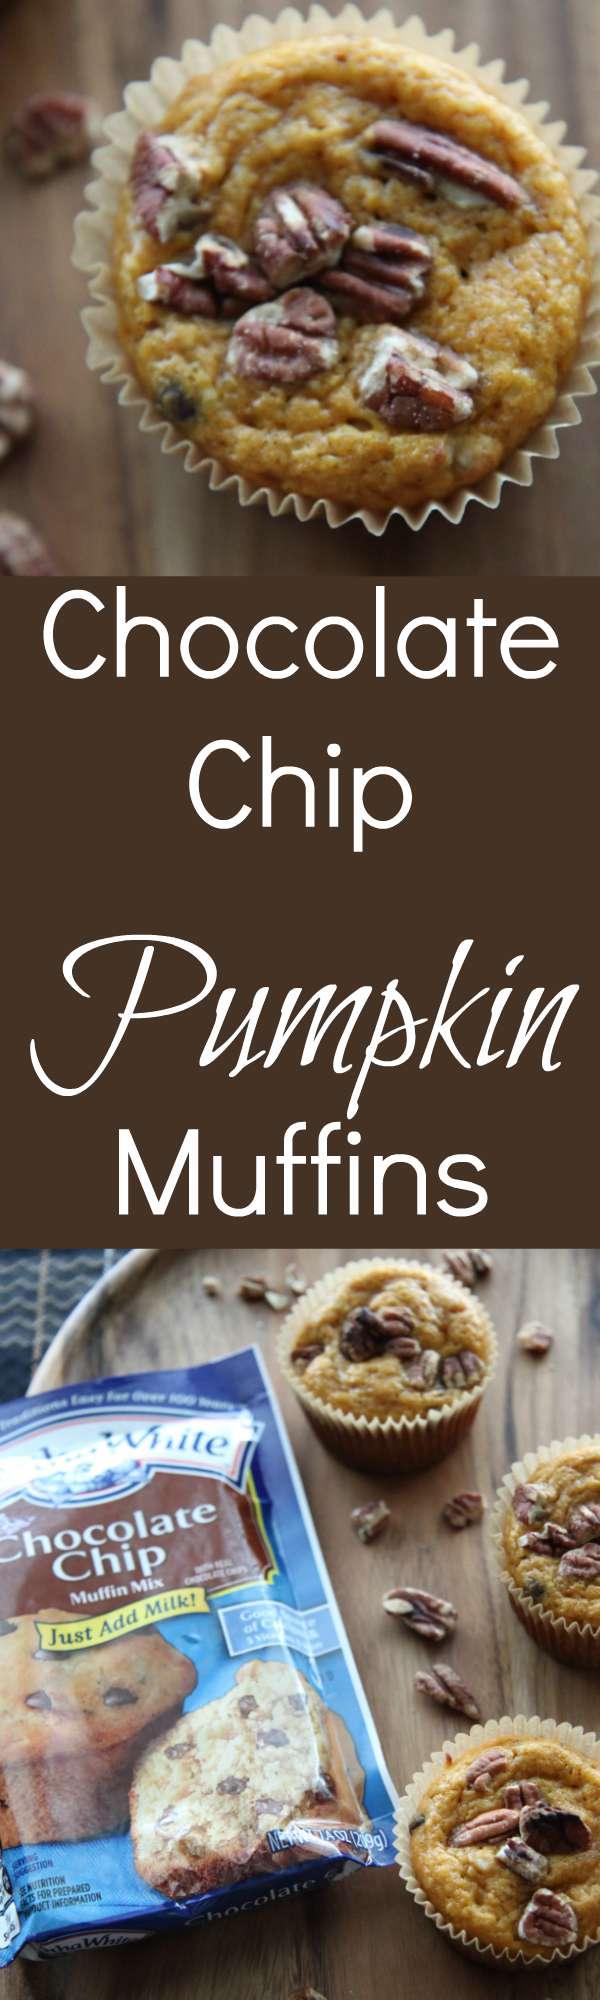 Chocolate Chip Pumpkin Muffins Made with Martha White